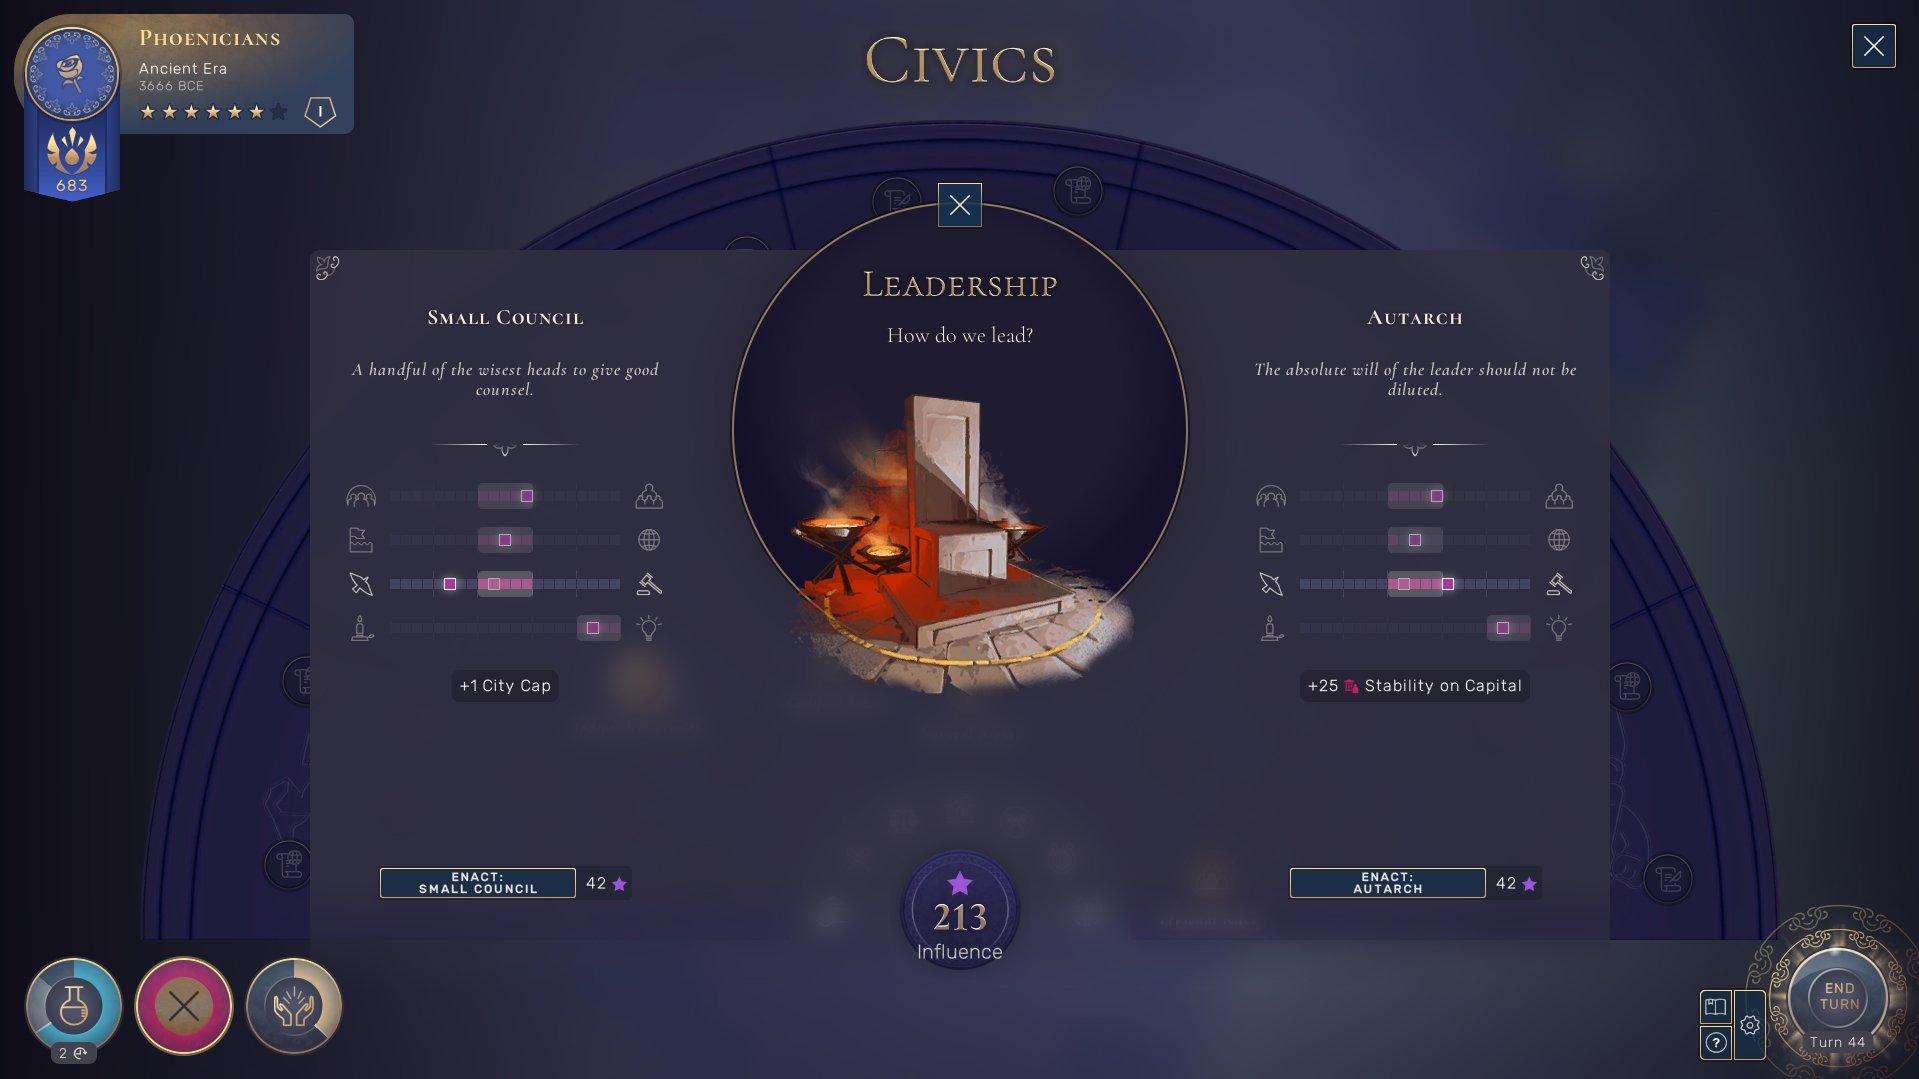 Humankind - Leadership Civic City Cap